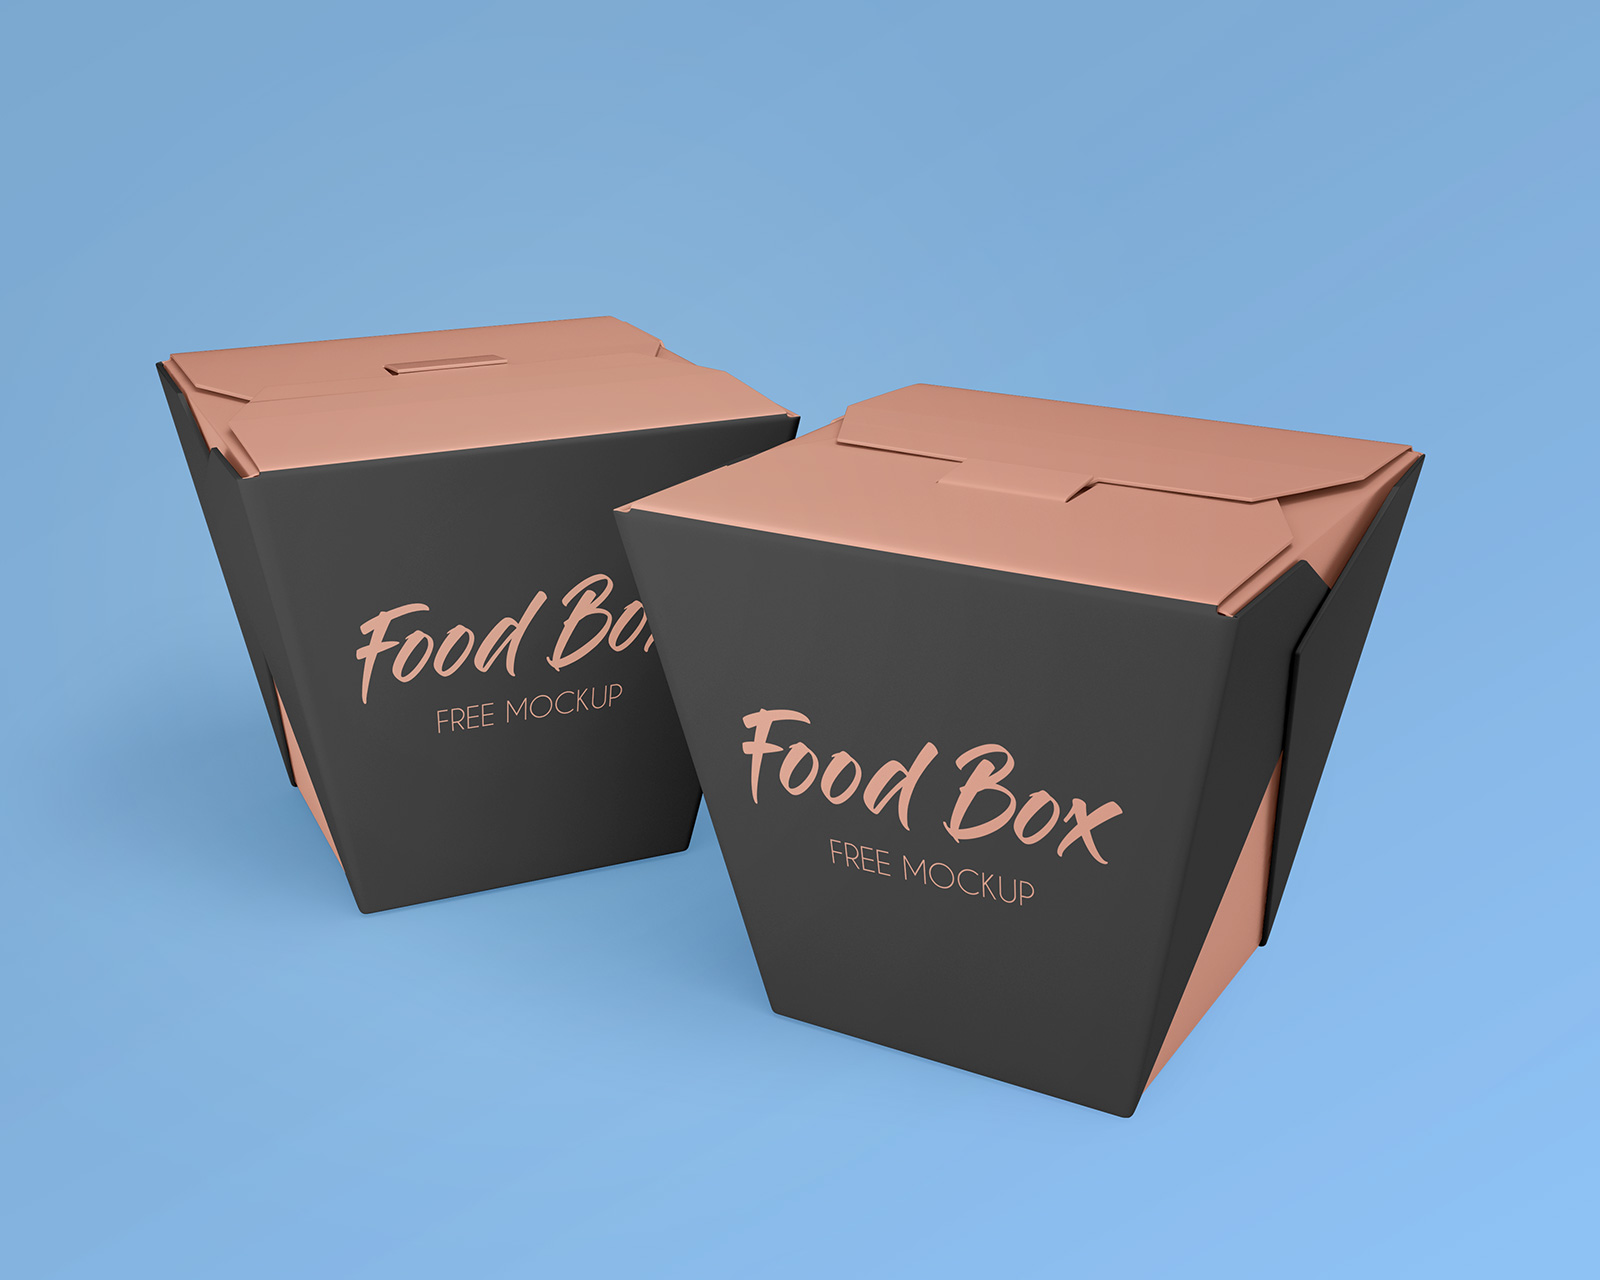 Free Noodle Food Box Packaging Mockup PSD Set